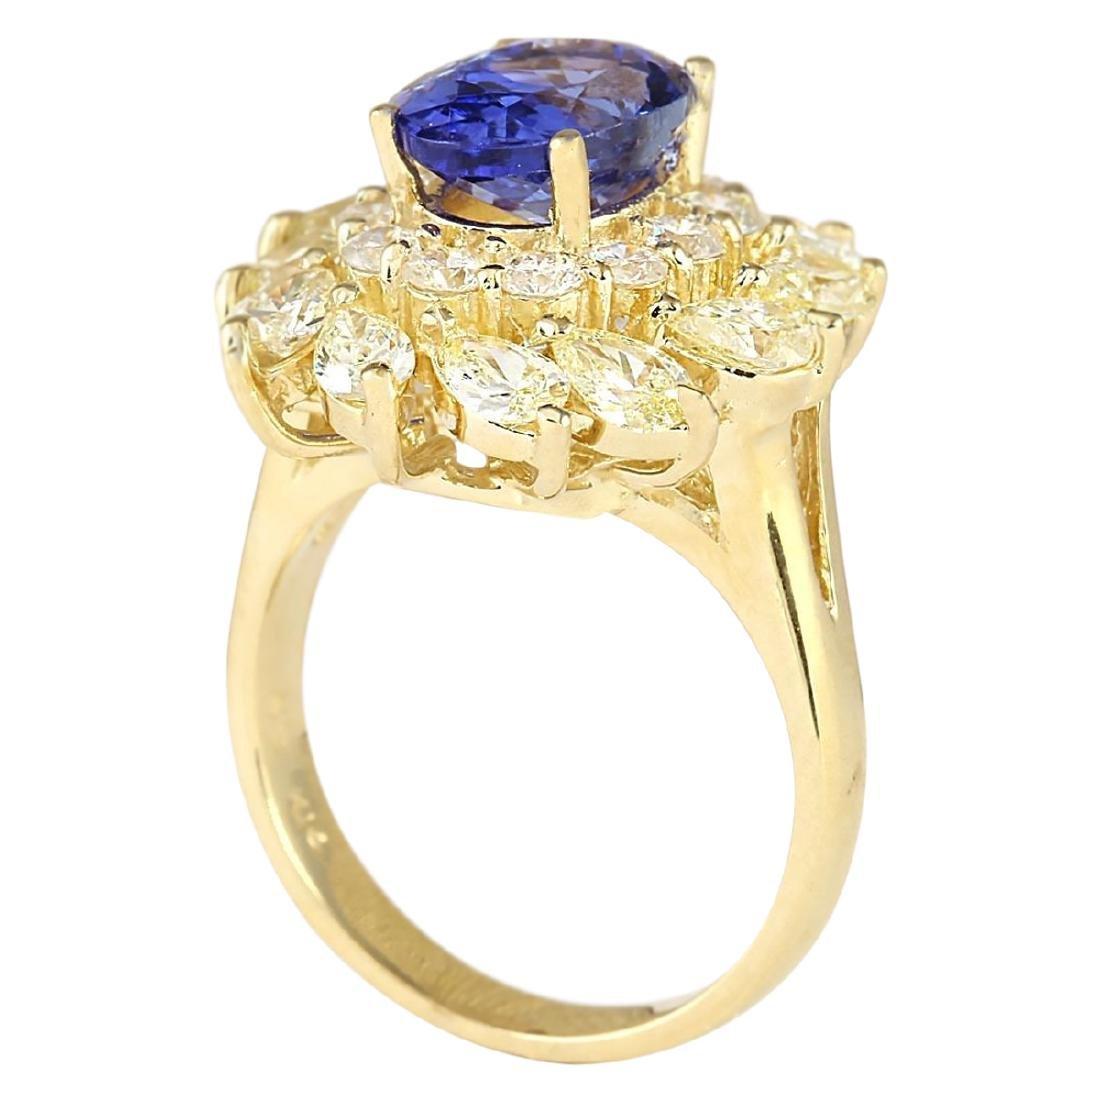 5.73 CTW Natural Tanzanite And Diamond Ring In 18K - 3